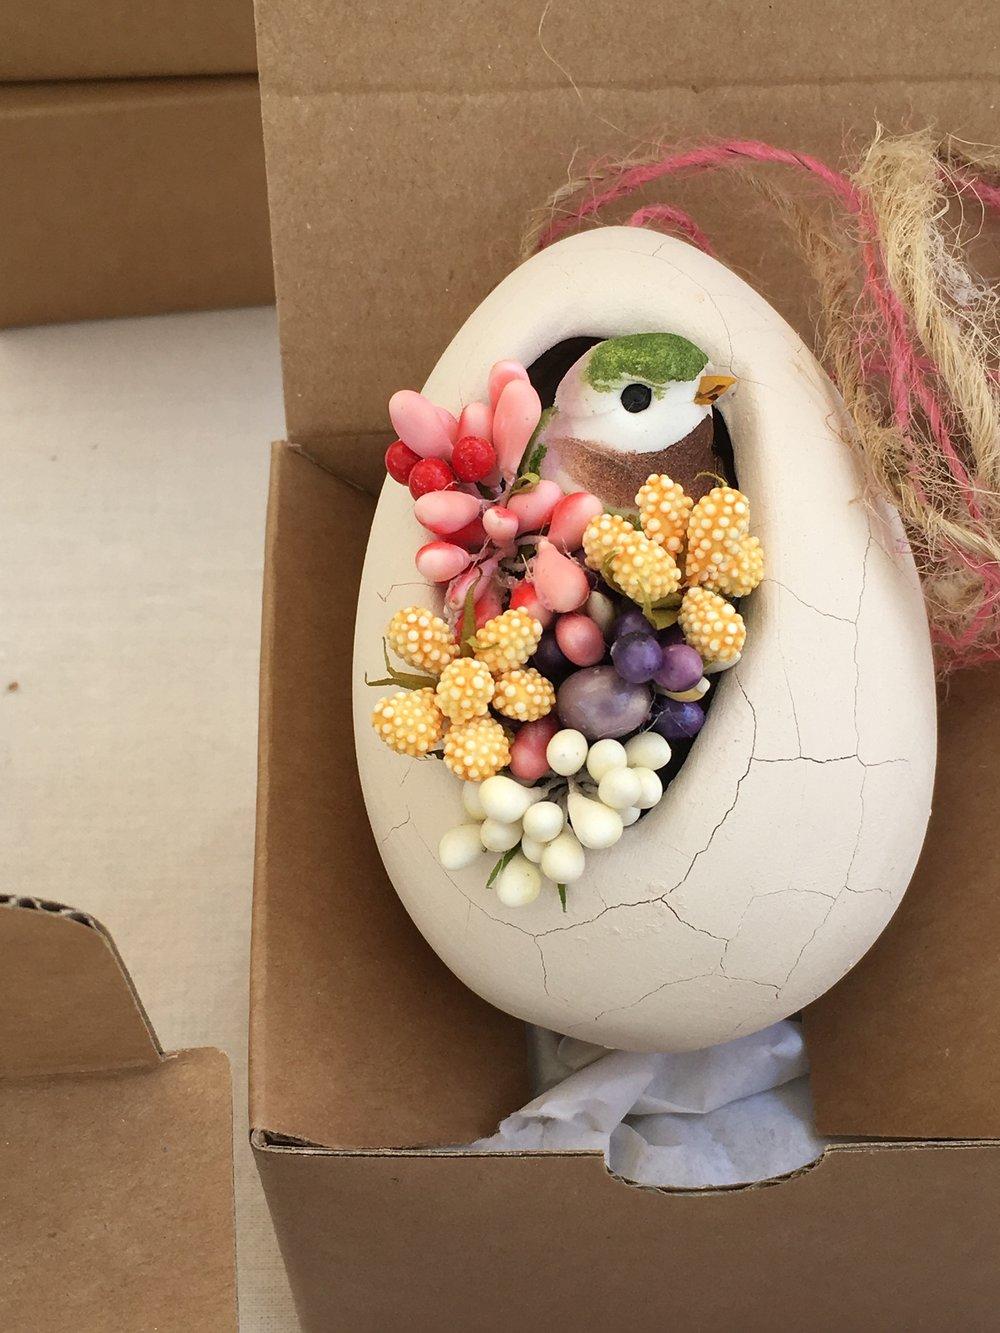 Handcrafted ceramic egg.